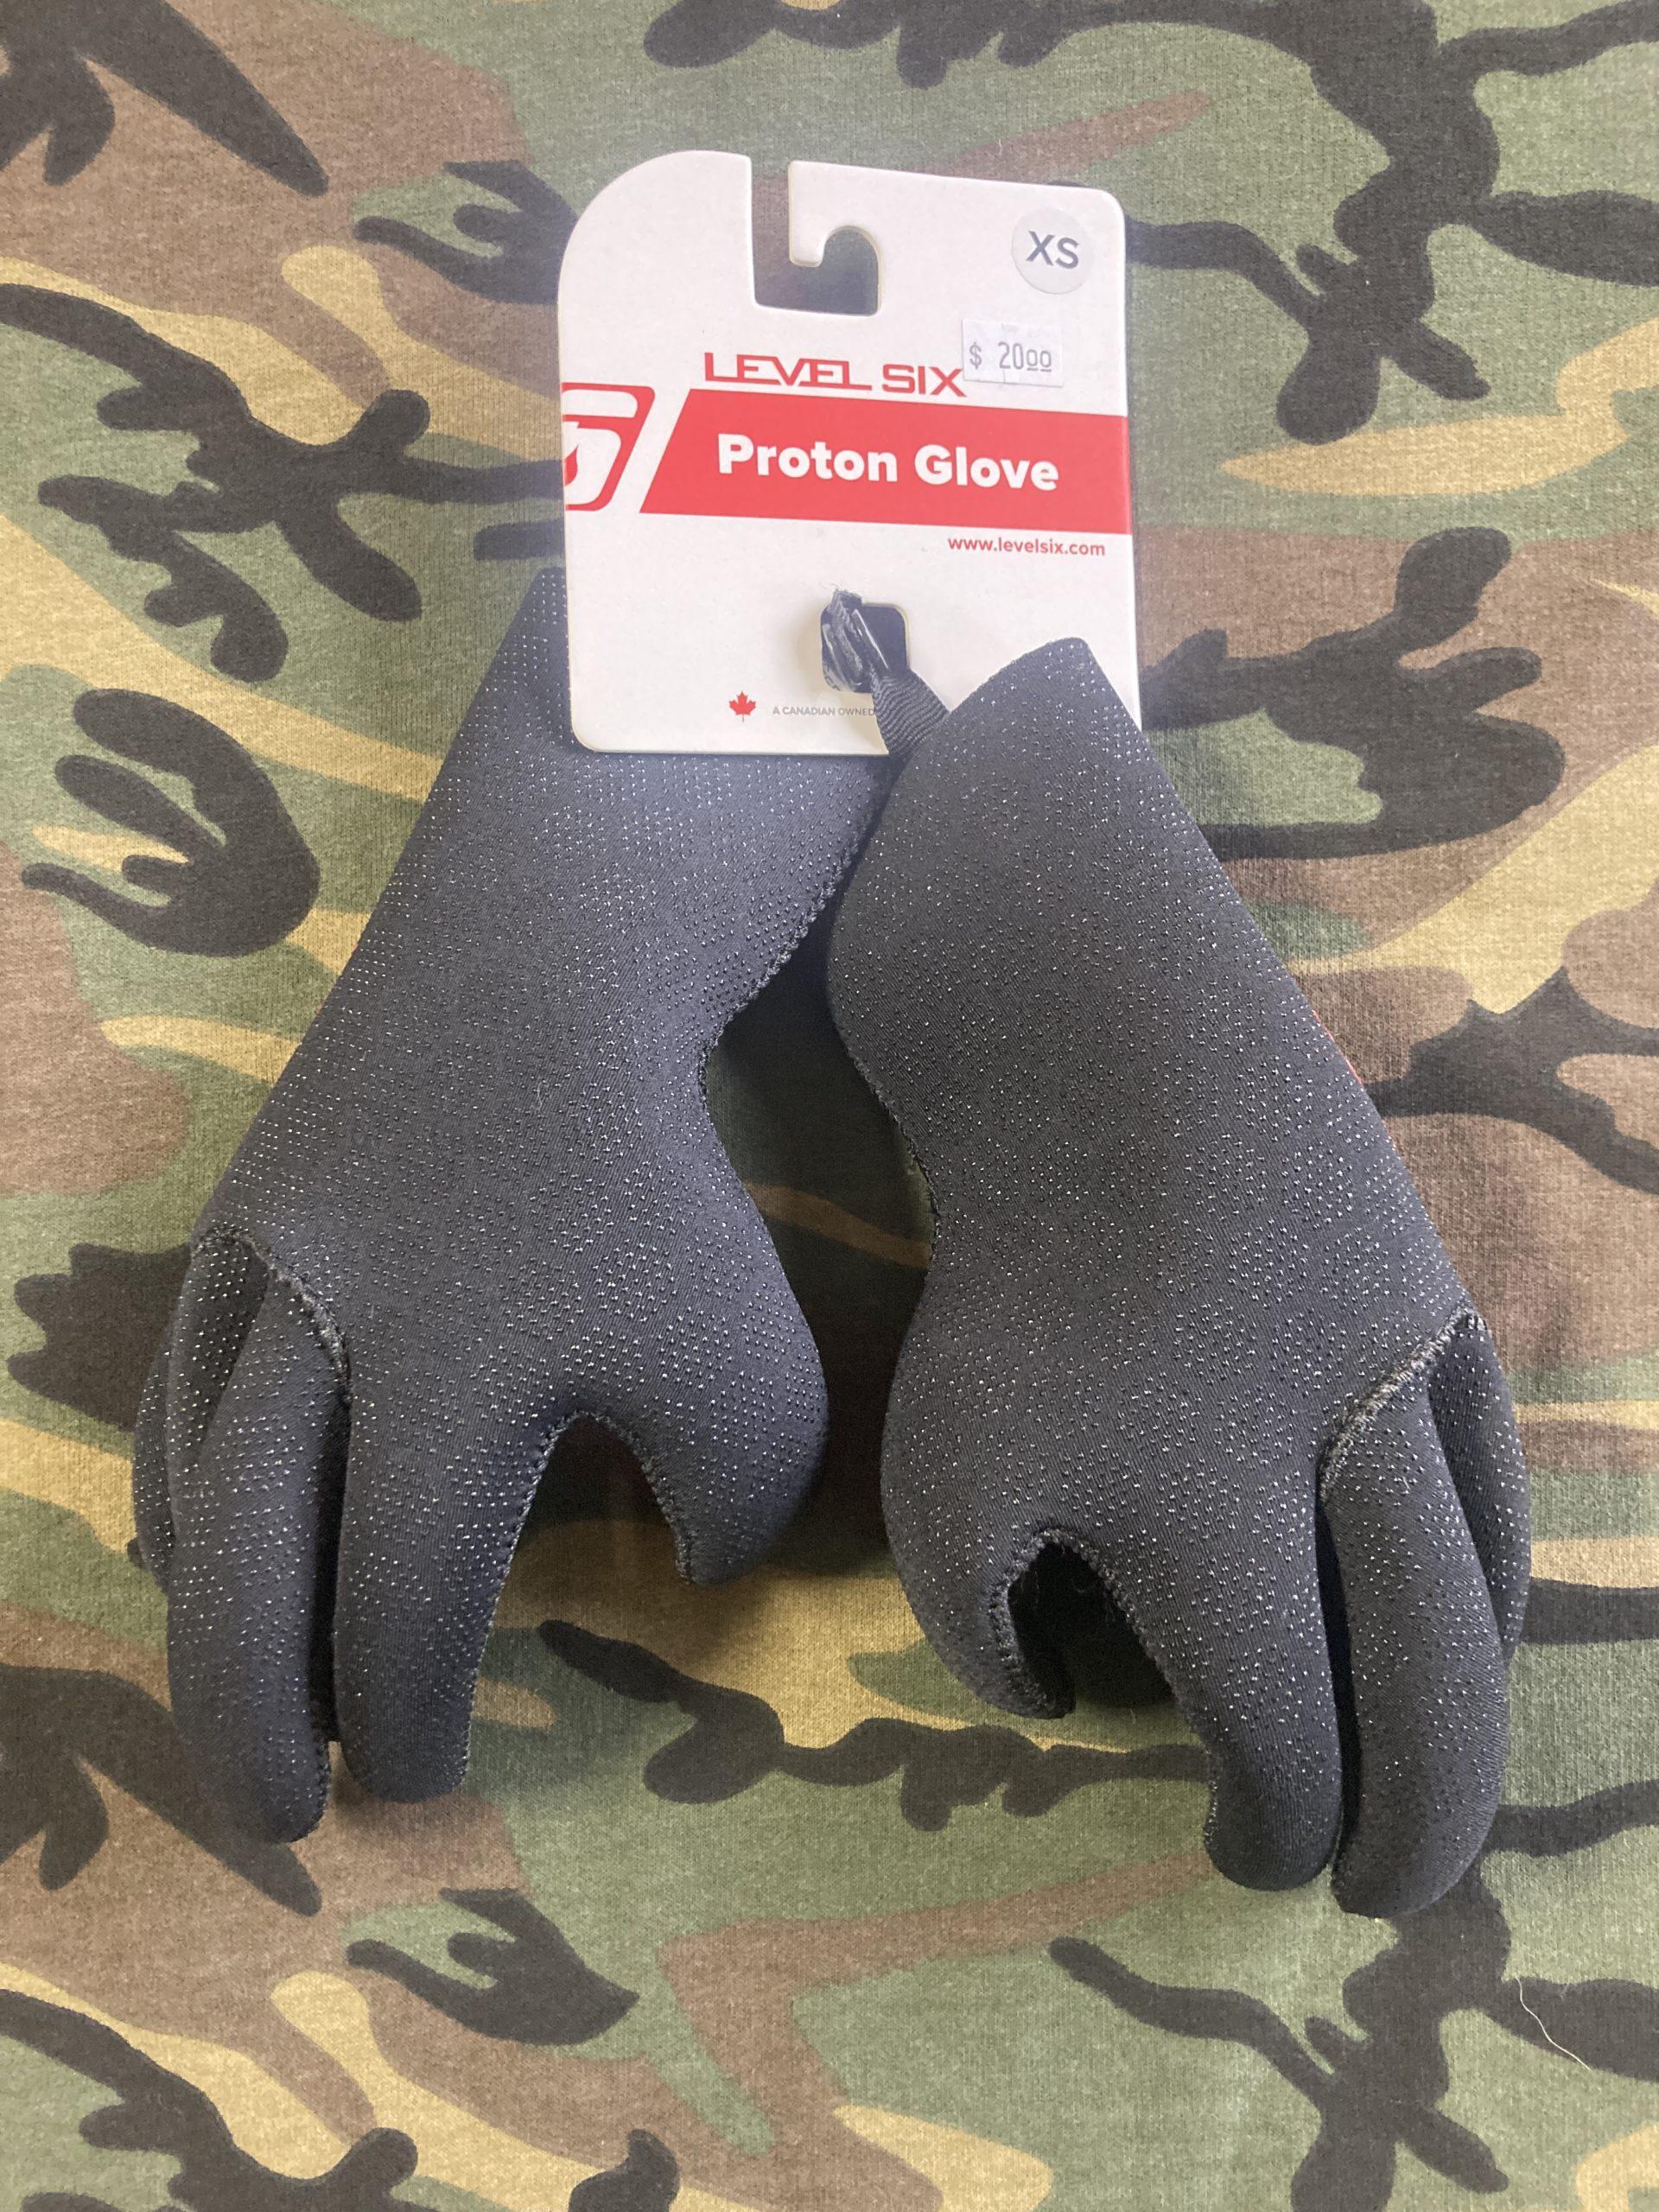 Level Six Proton Glove